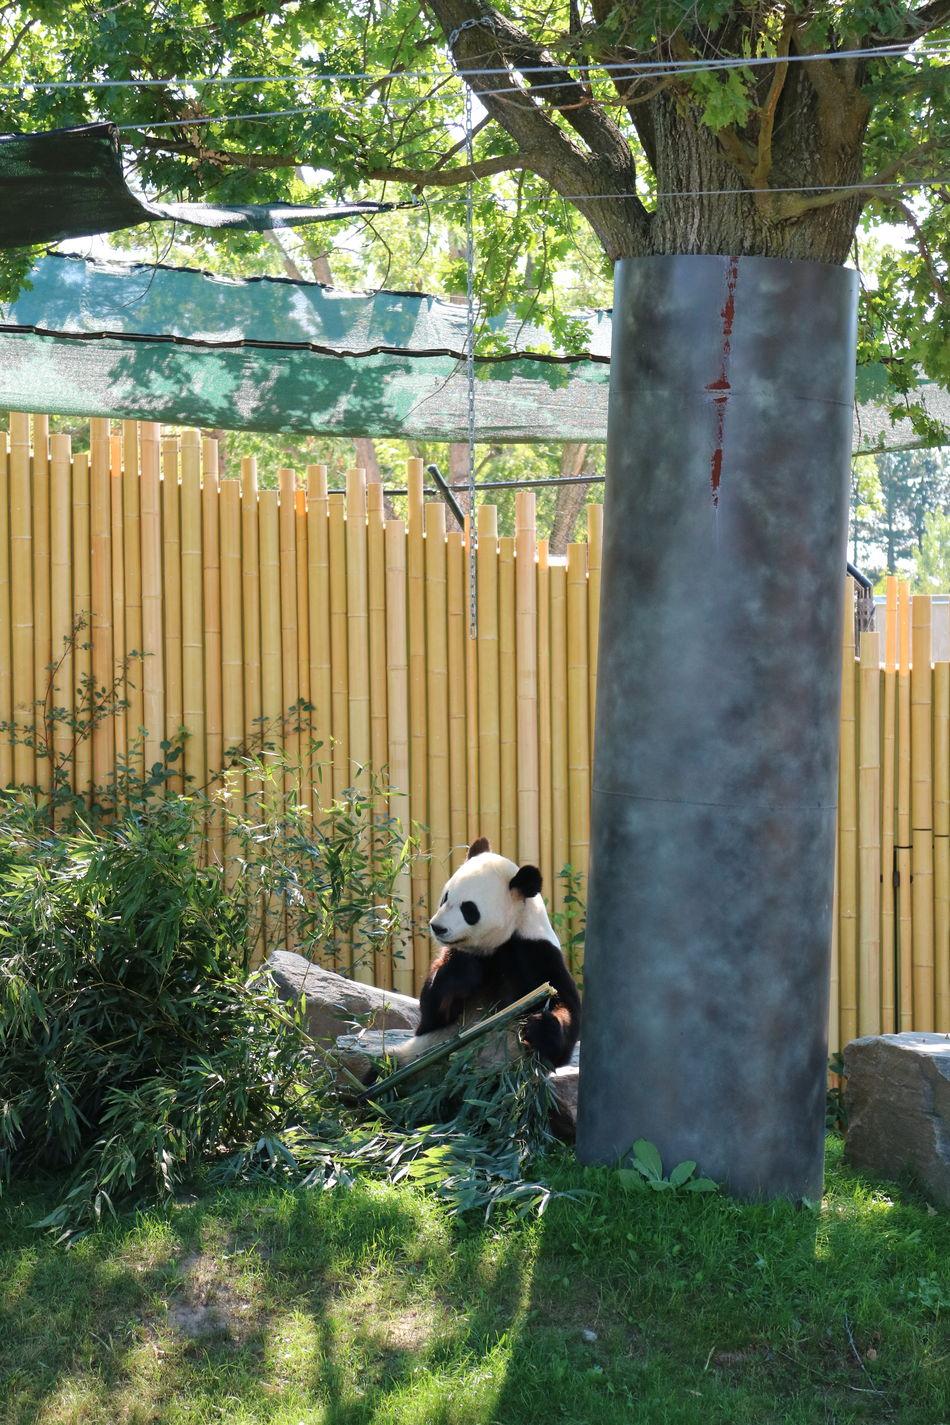 Animal Themes Bamboo Fence Day Grass Grass Mammal Nature No People One Animal Outdoors Panda Bear Toronto Zoo Tree Tree